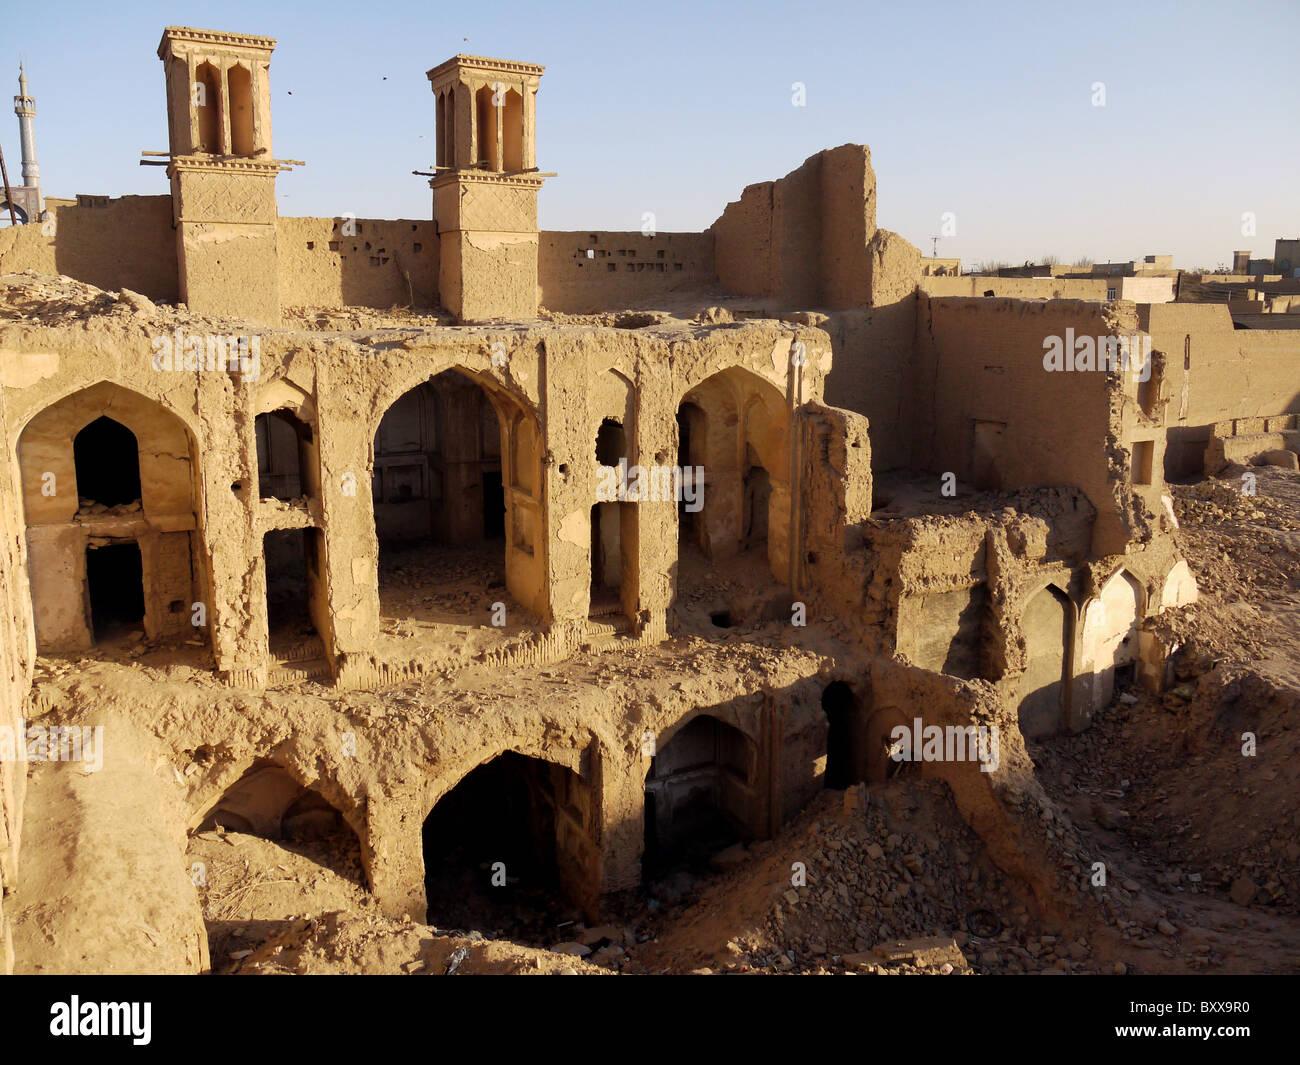 Crumbling mud-brick housing in Yazd Iran - Stock Image